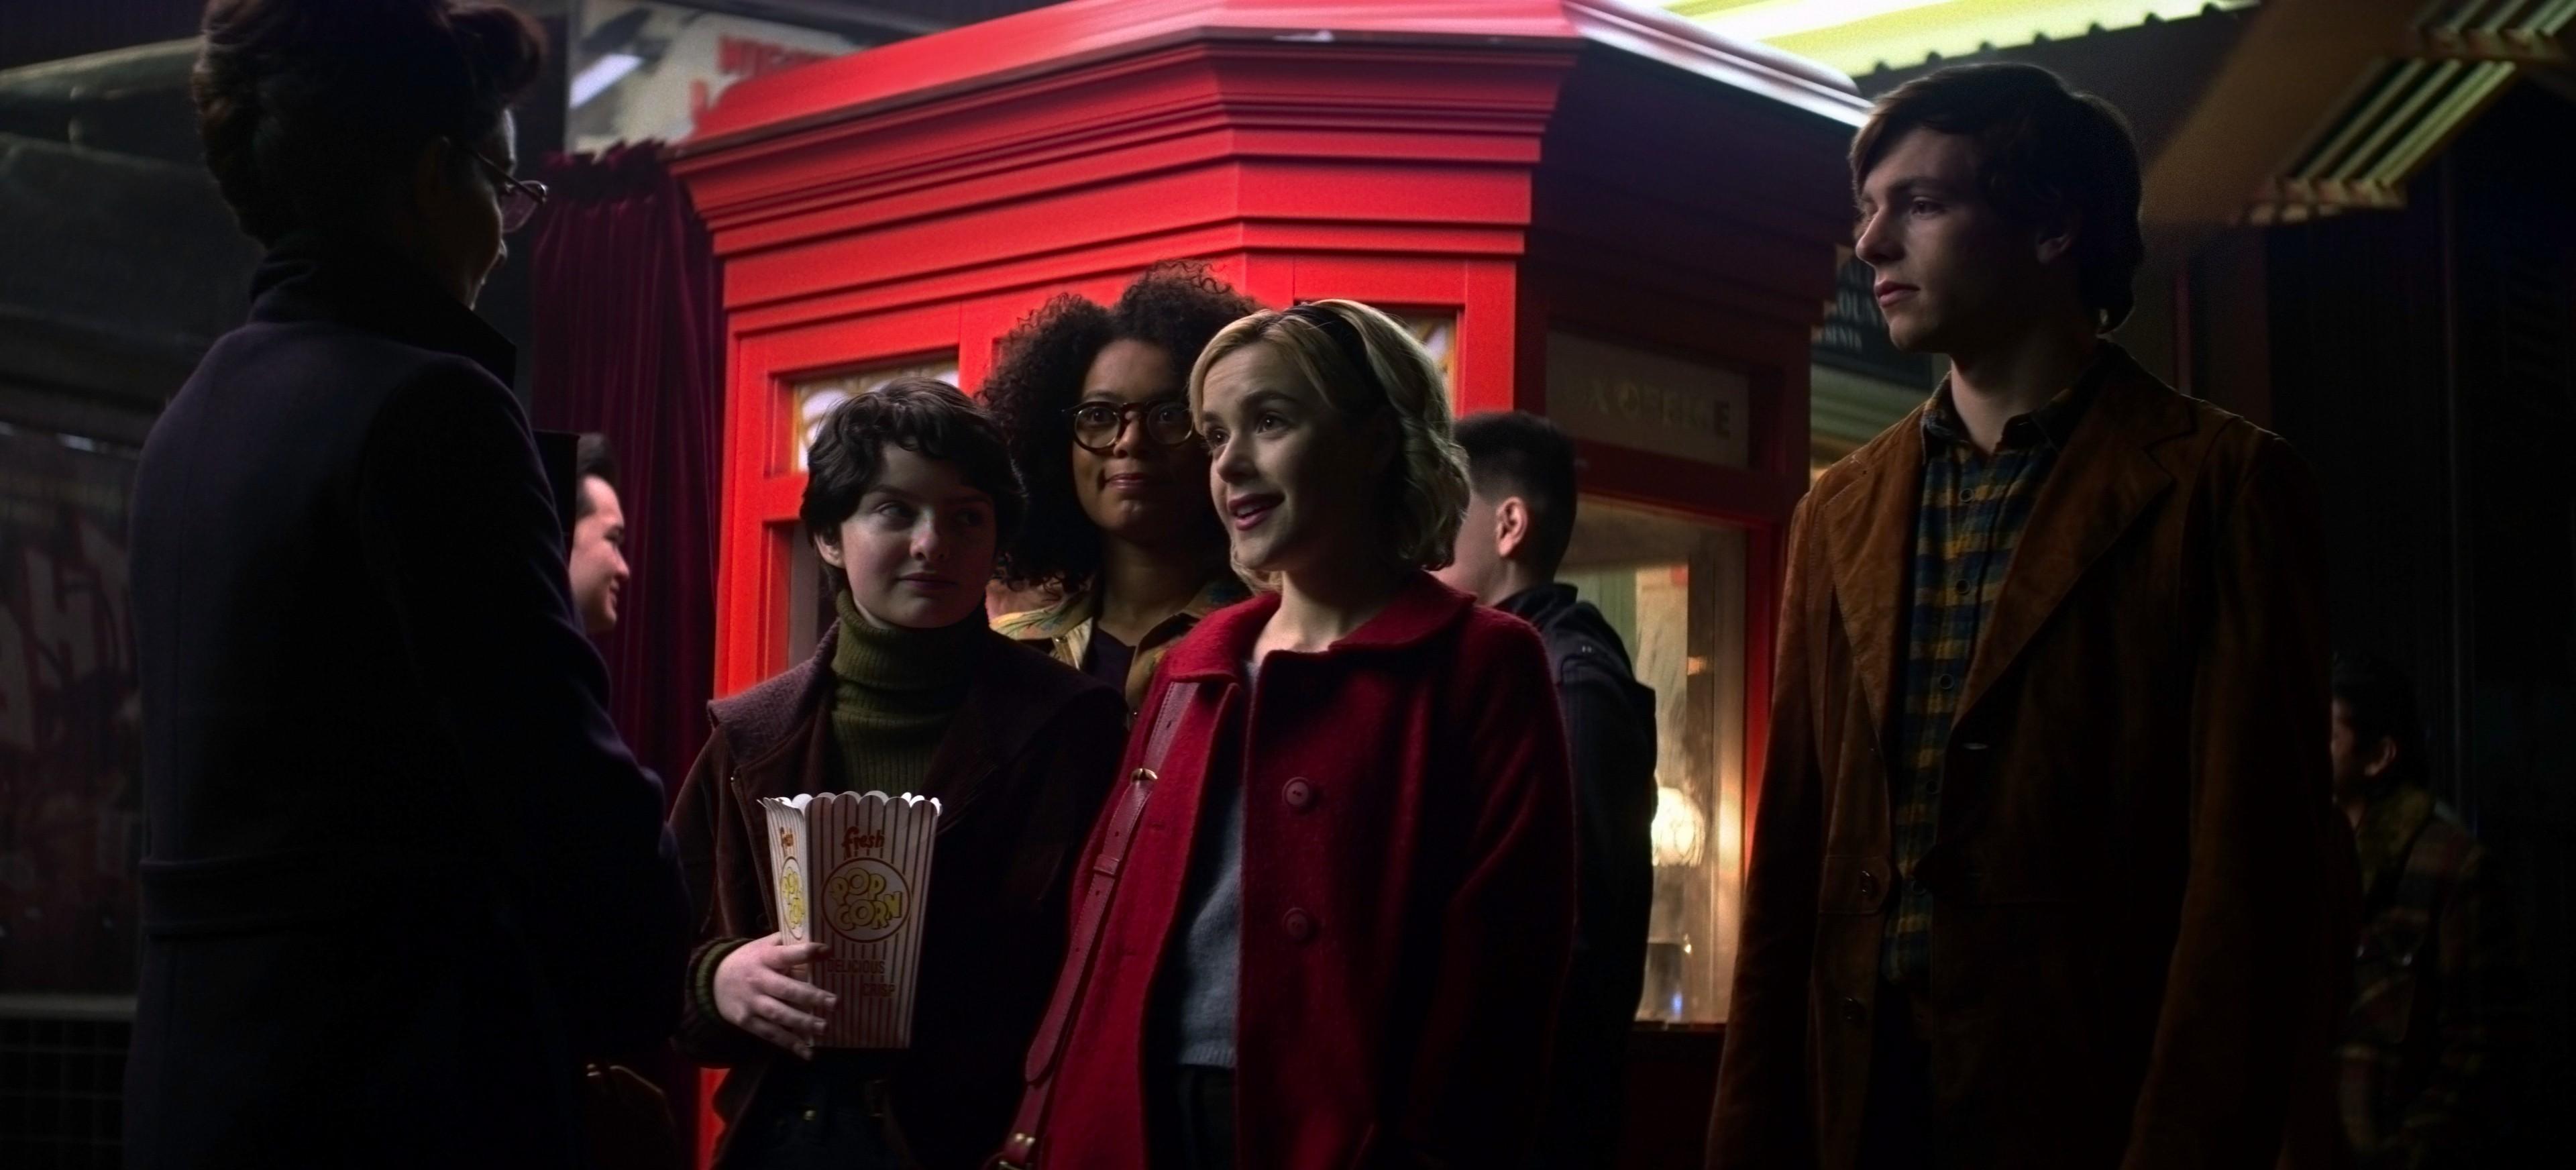 Da esquerda para a direita: Michelle Gomez, Lachlan Watson, Jaz Sinclair, Kiernan Shipka, Ross Lynch (Foto: Netflix)